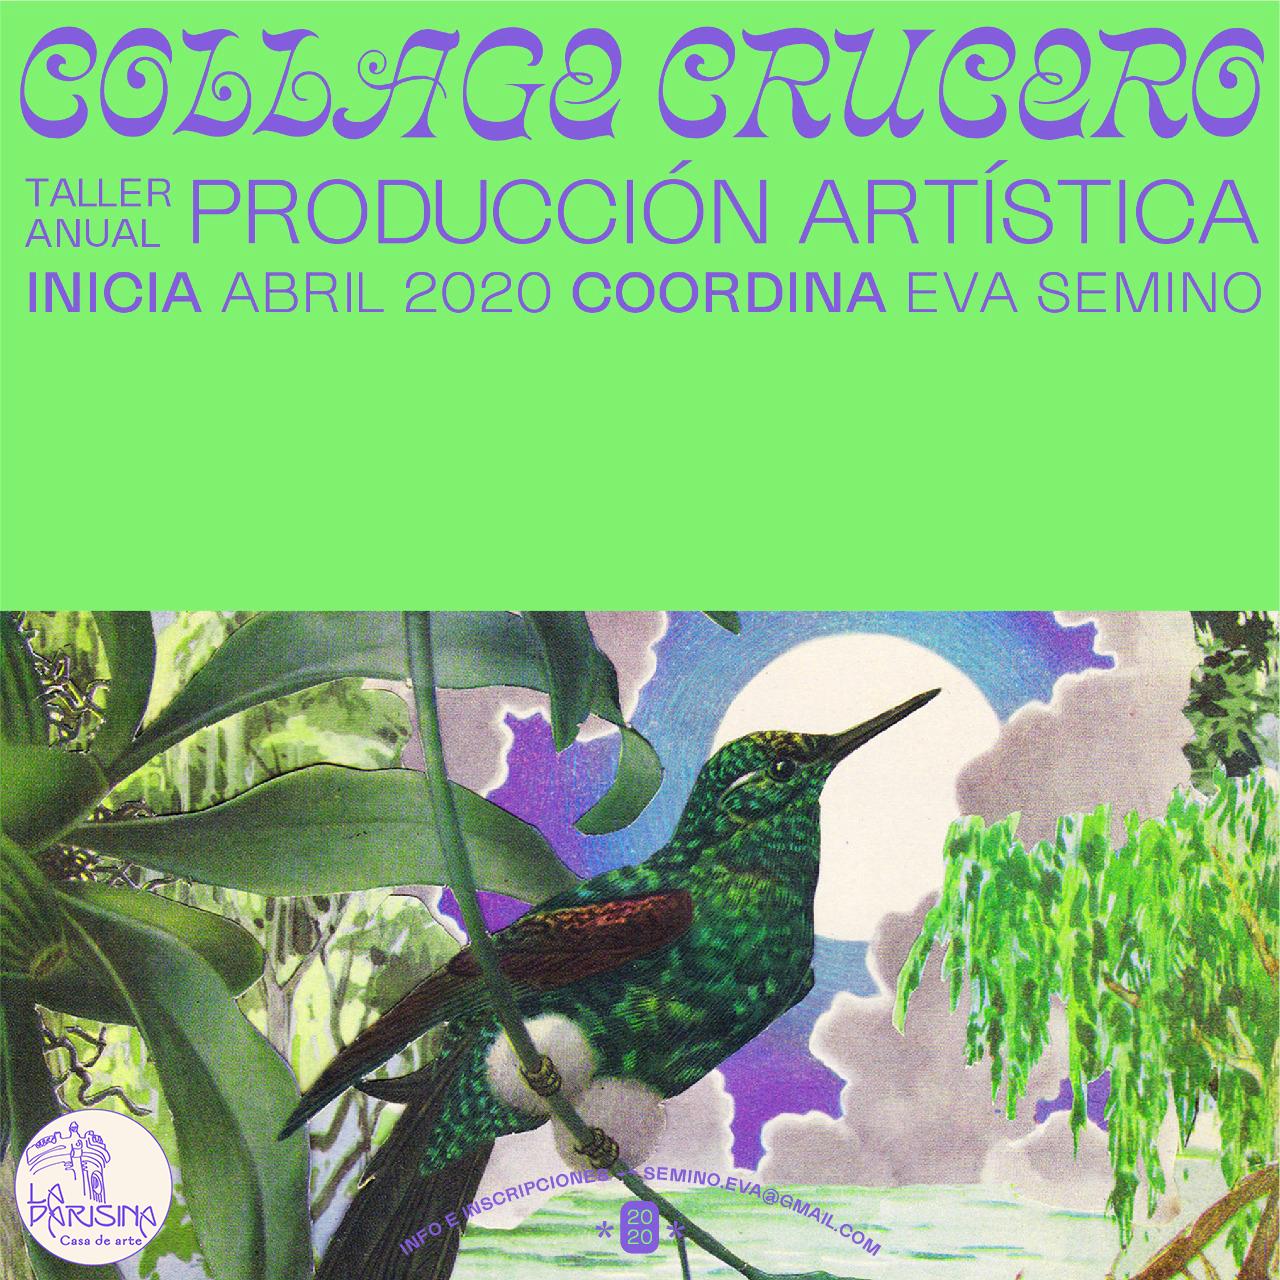 COLLAGE CRUCERO